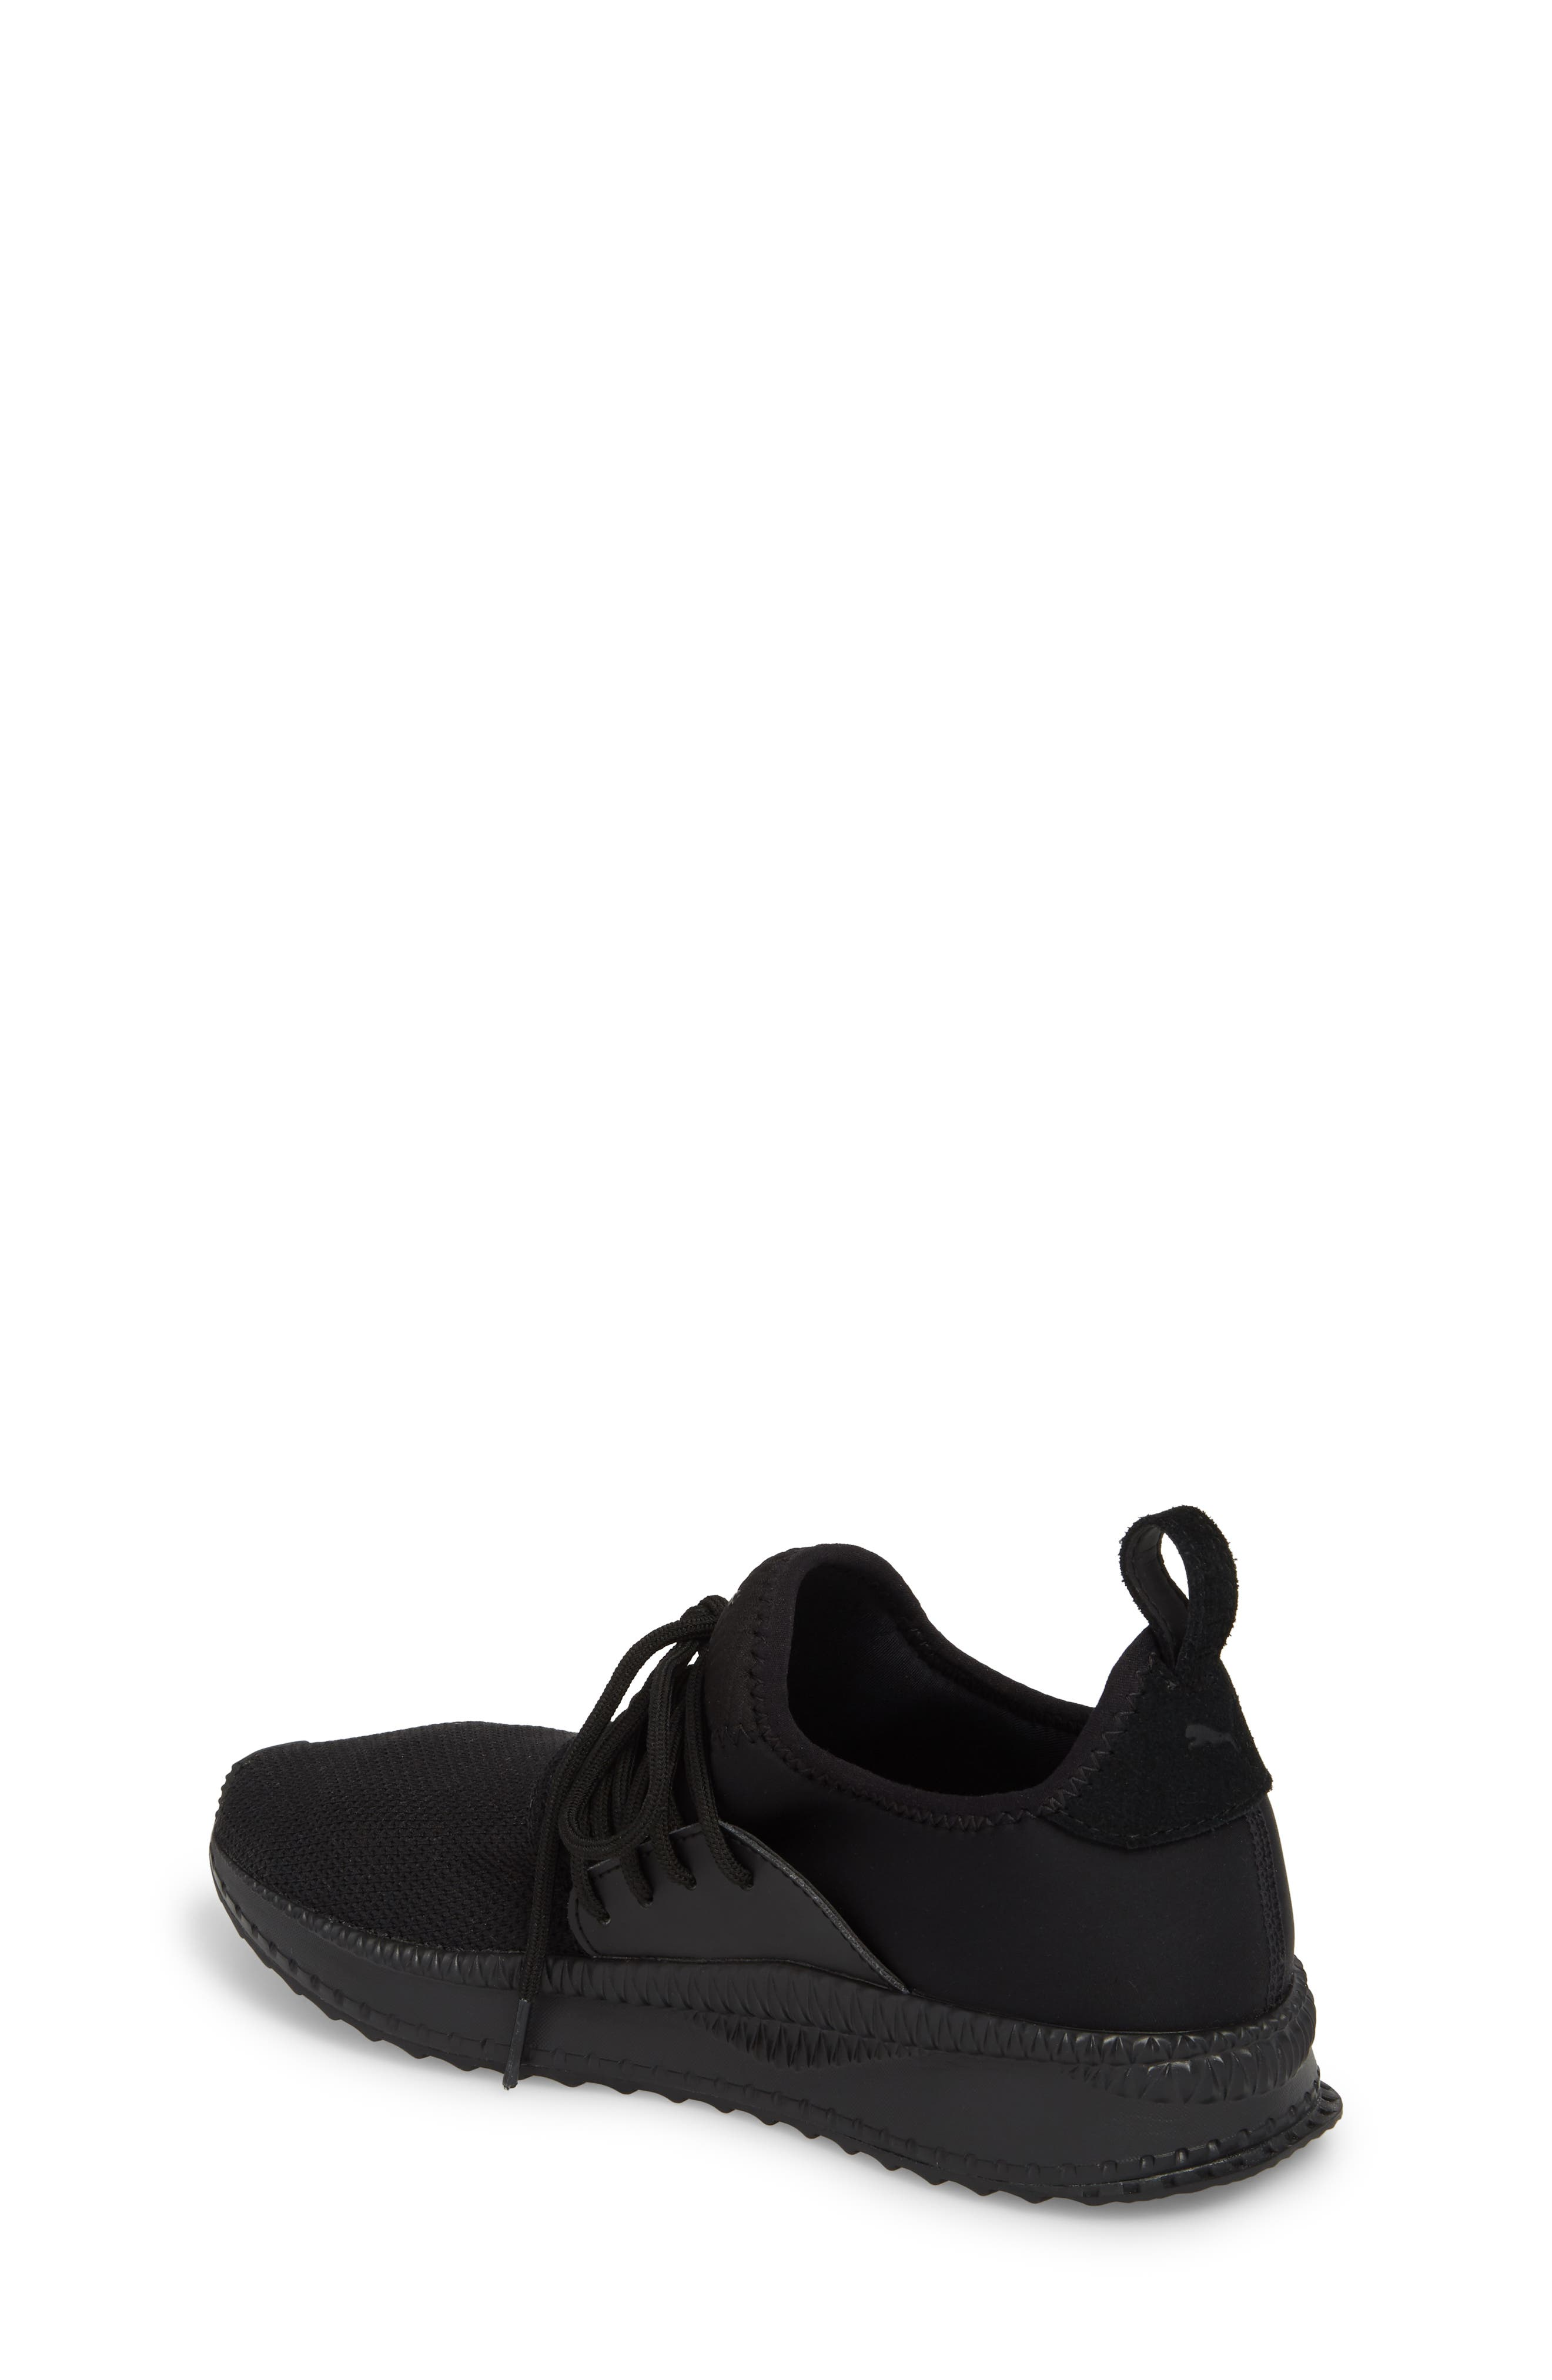 Tsugi Apex Sneaker,                             Alternate thumbnail 2, color,                             001